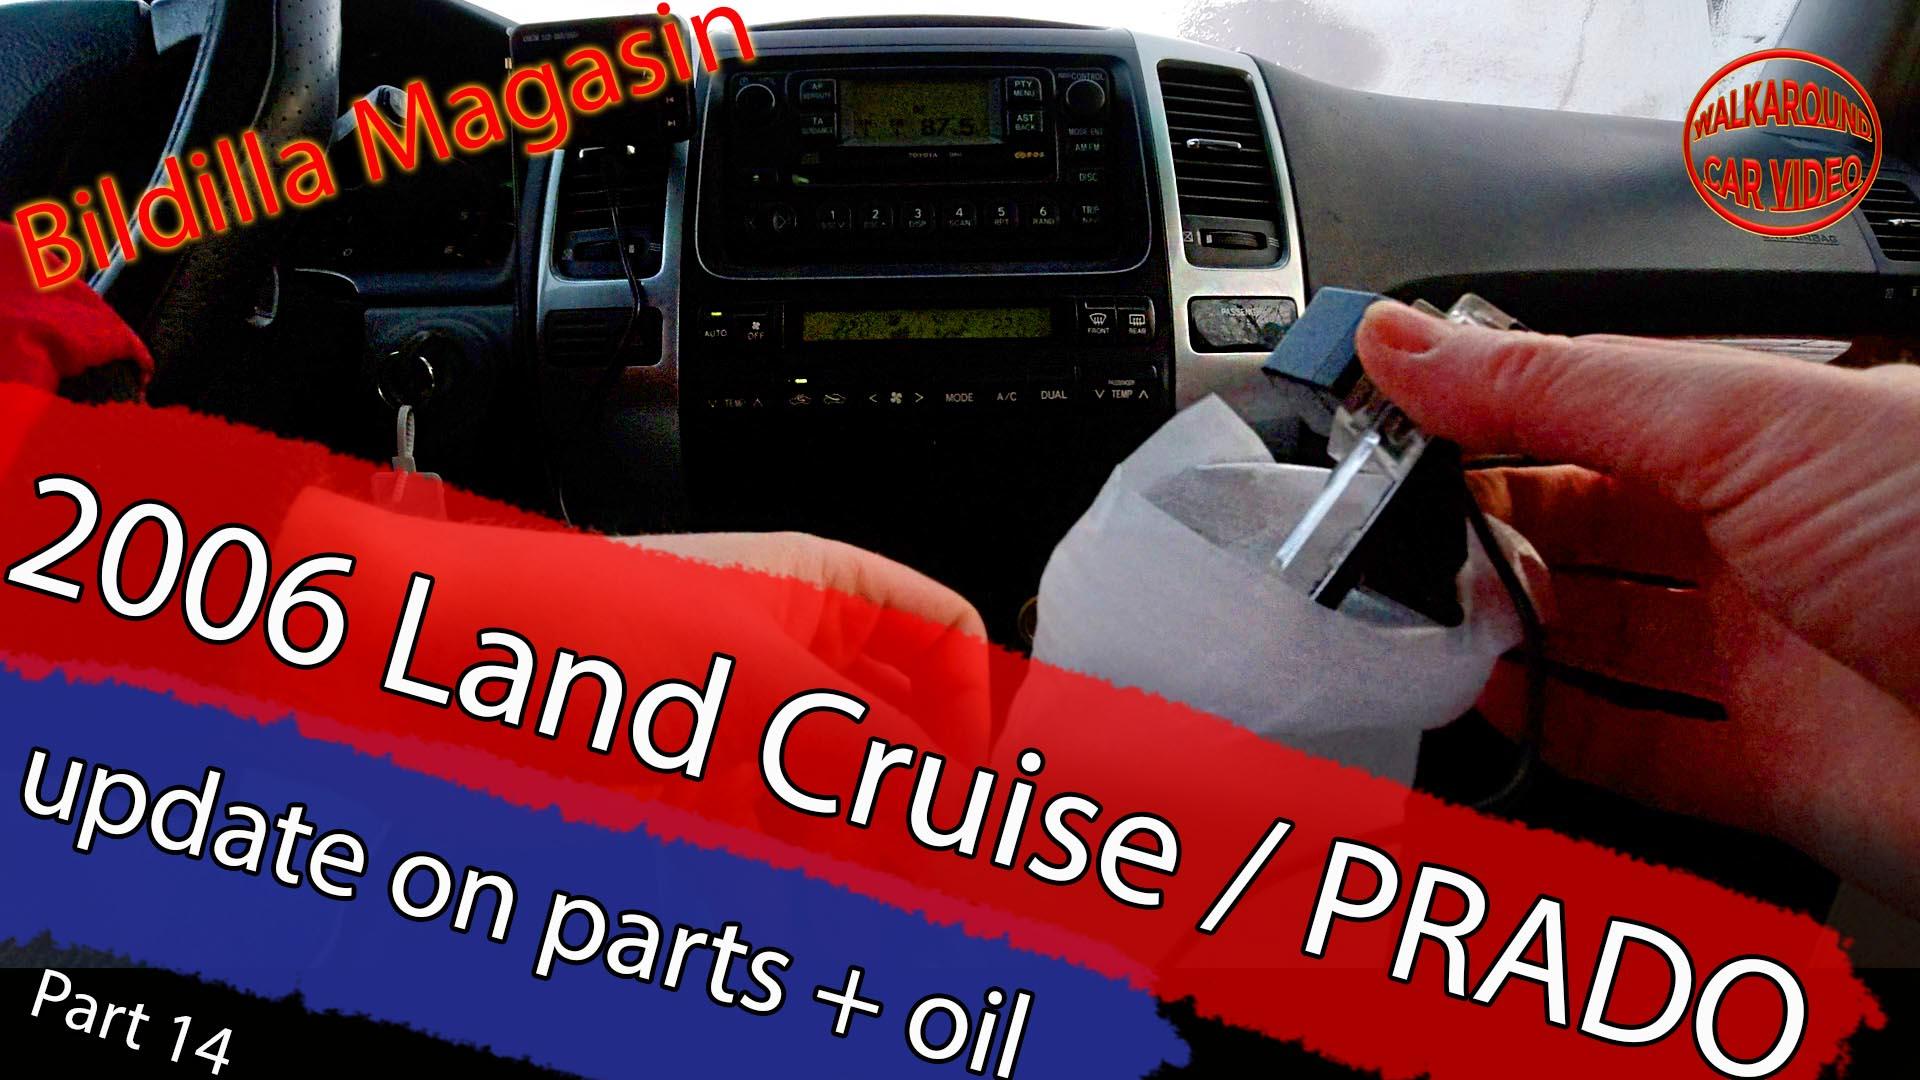 Land Cruiser 06 – del 14